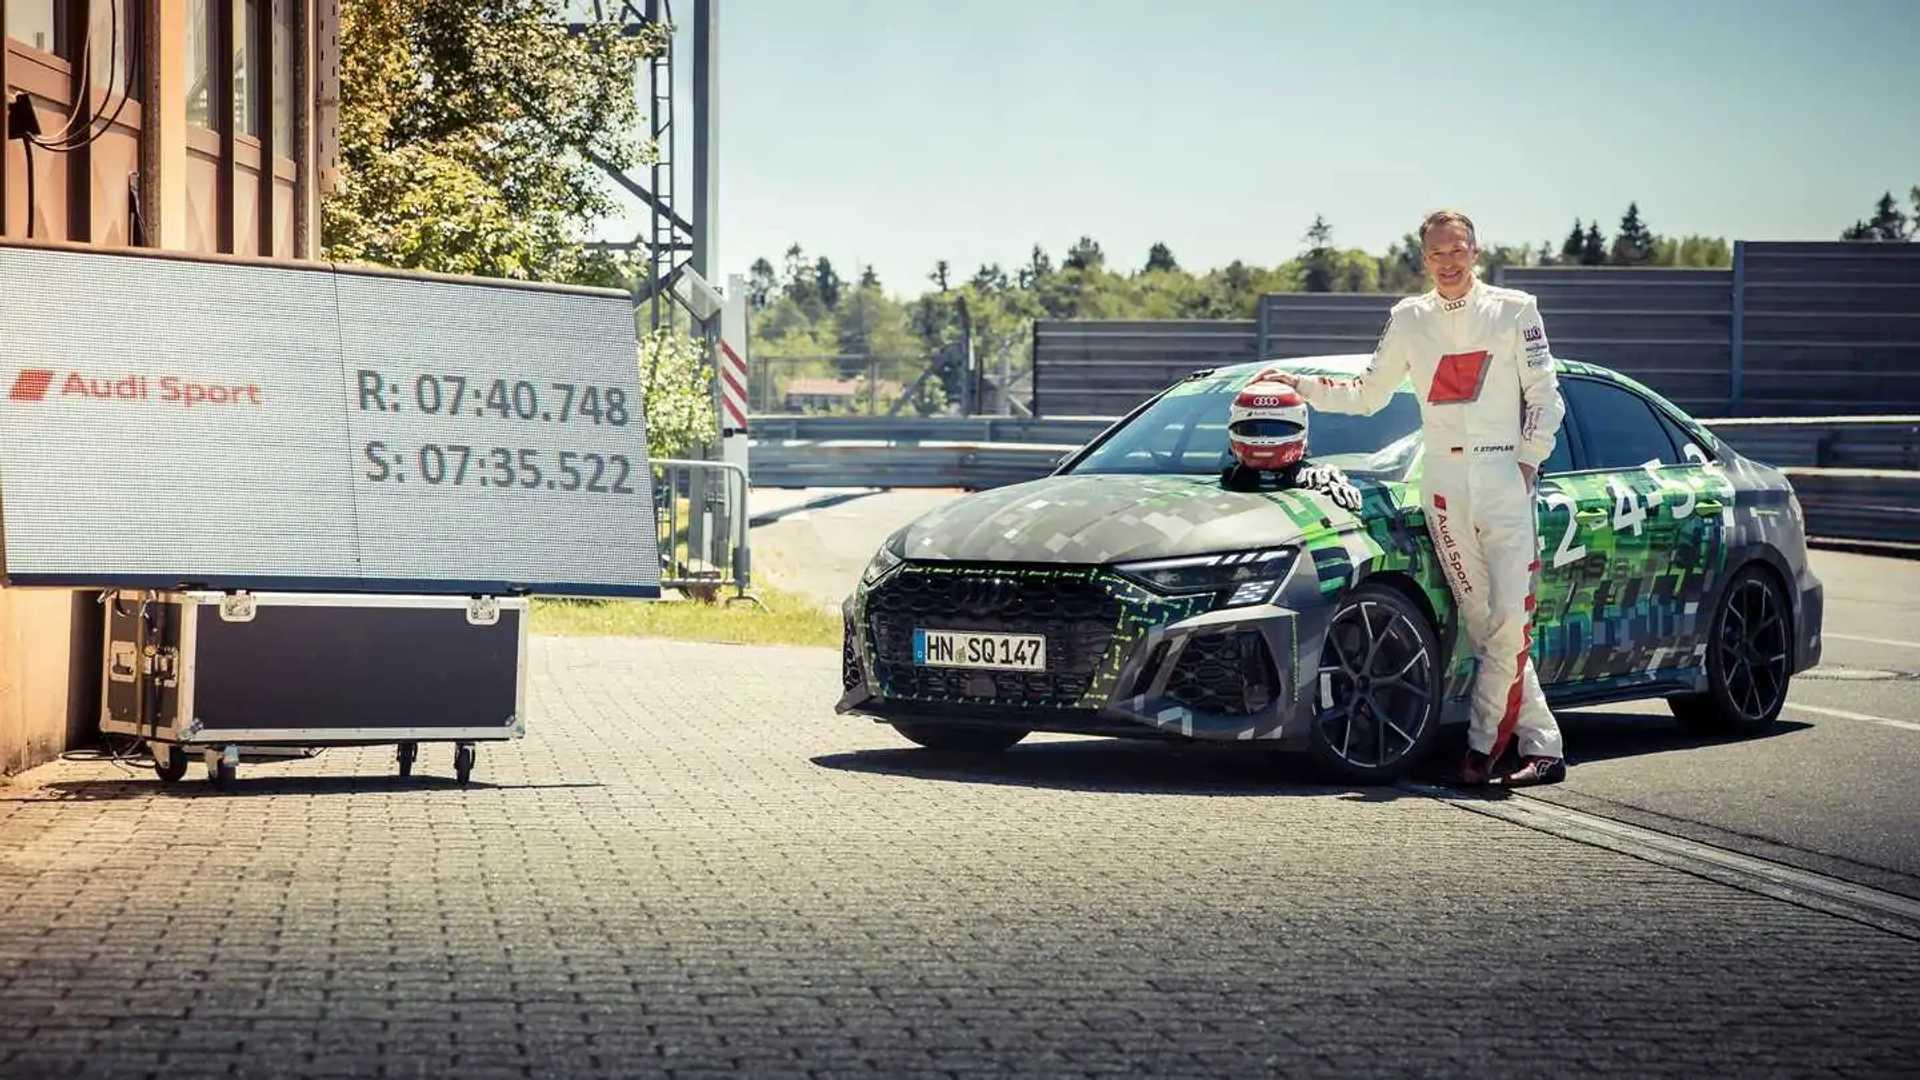 Audi RS3 Sedan sets Nürburgring lap record for compact cars